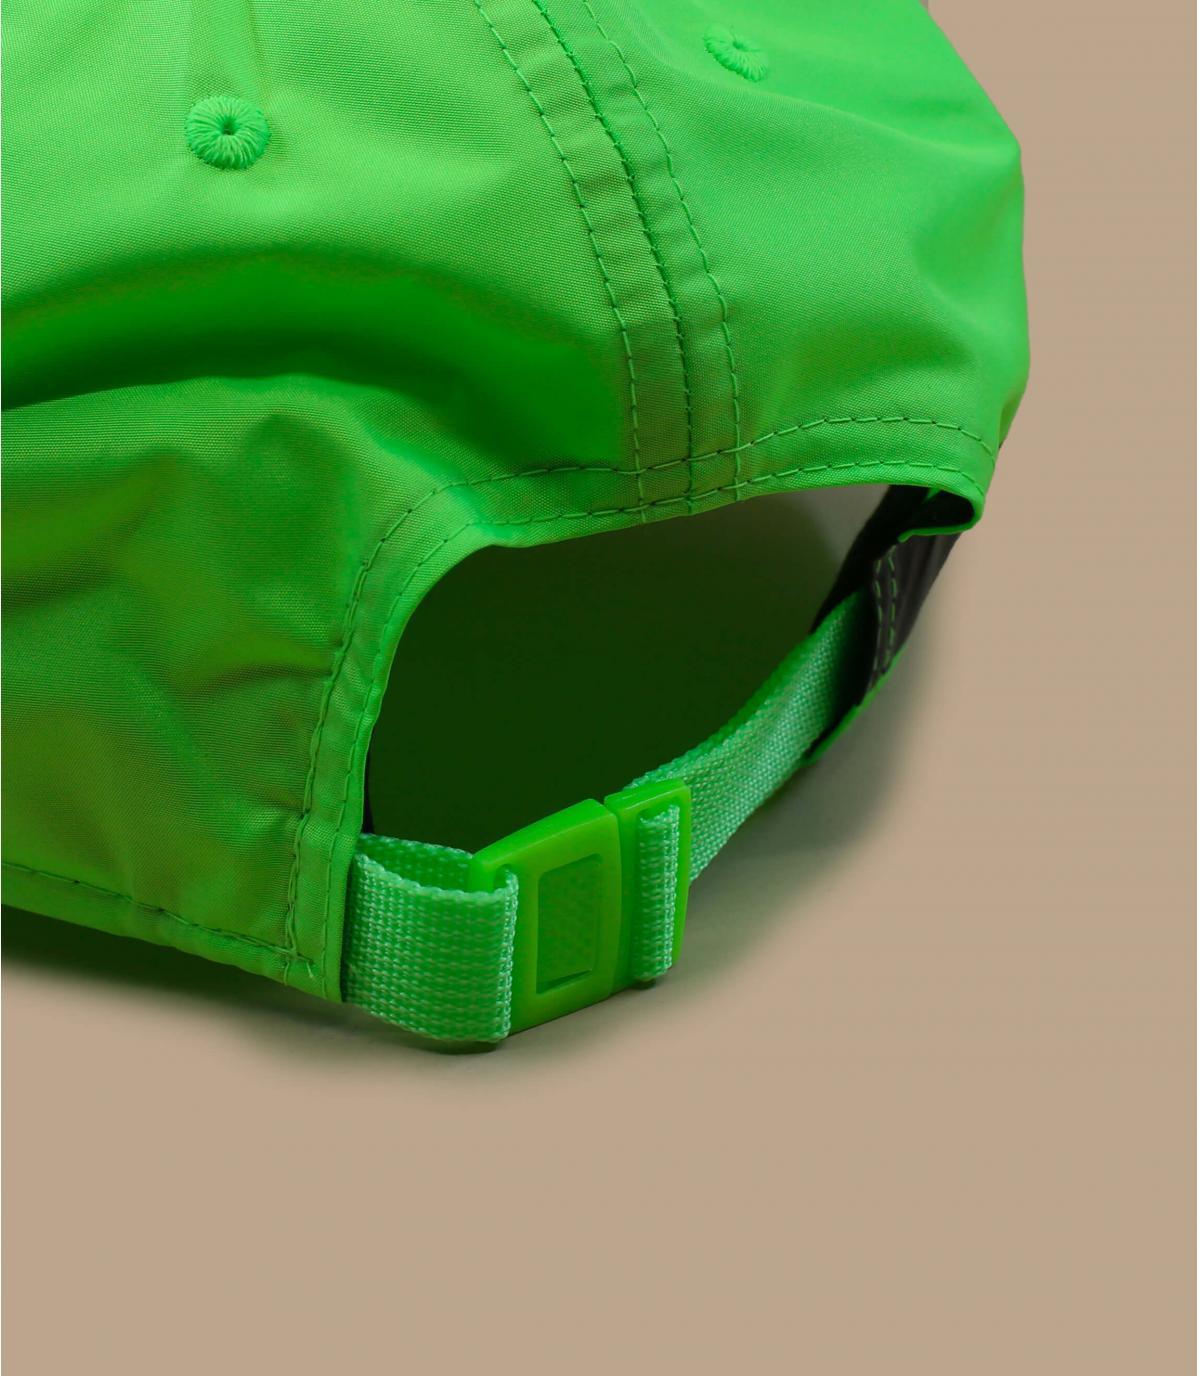 Details Contemporary 940 neon green - Abbildung 5